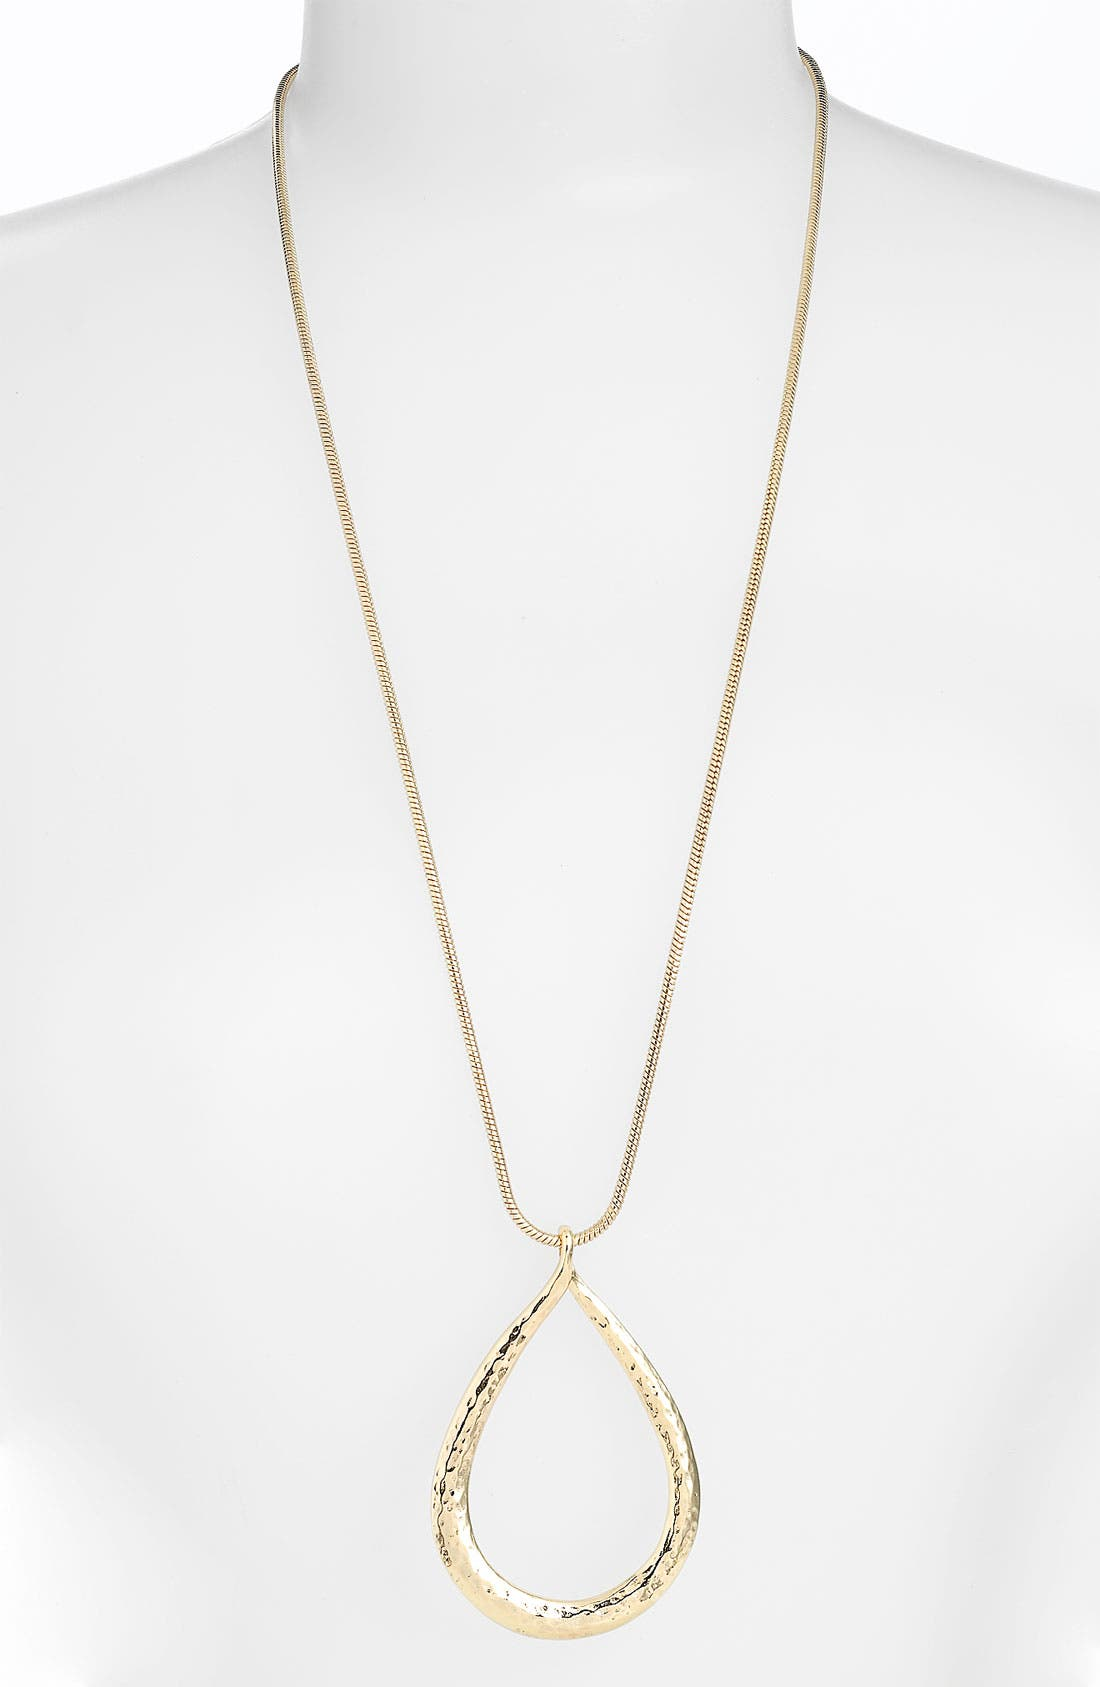 Alternate Image 1 Selected - Nordstrom Long Hammered Teardrop Pendant Necklace